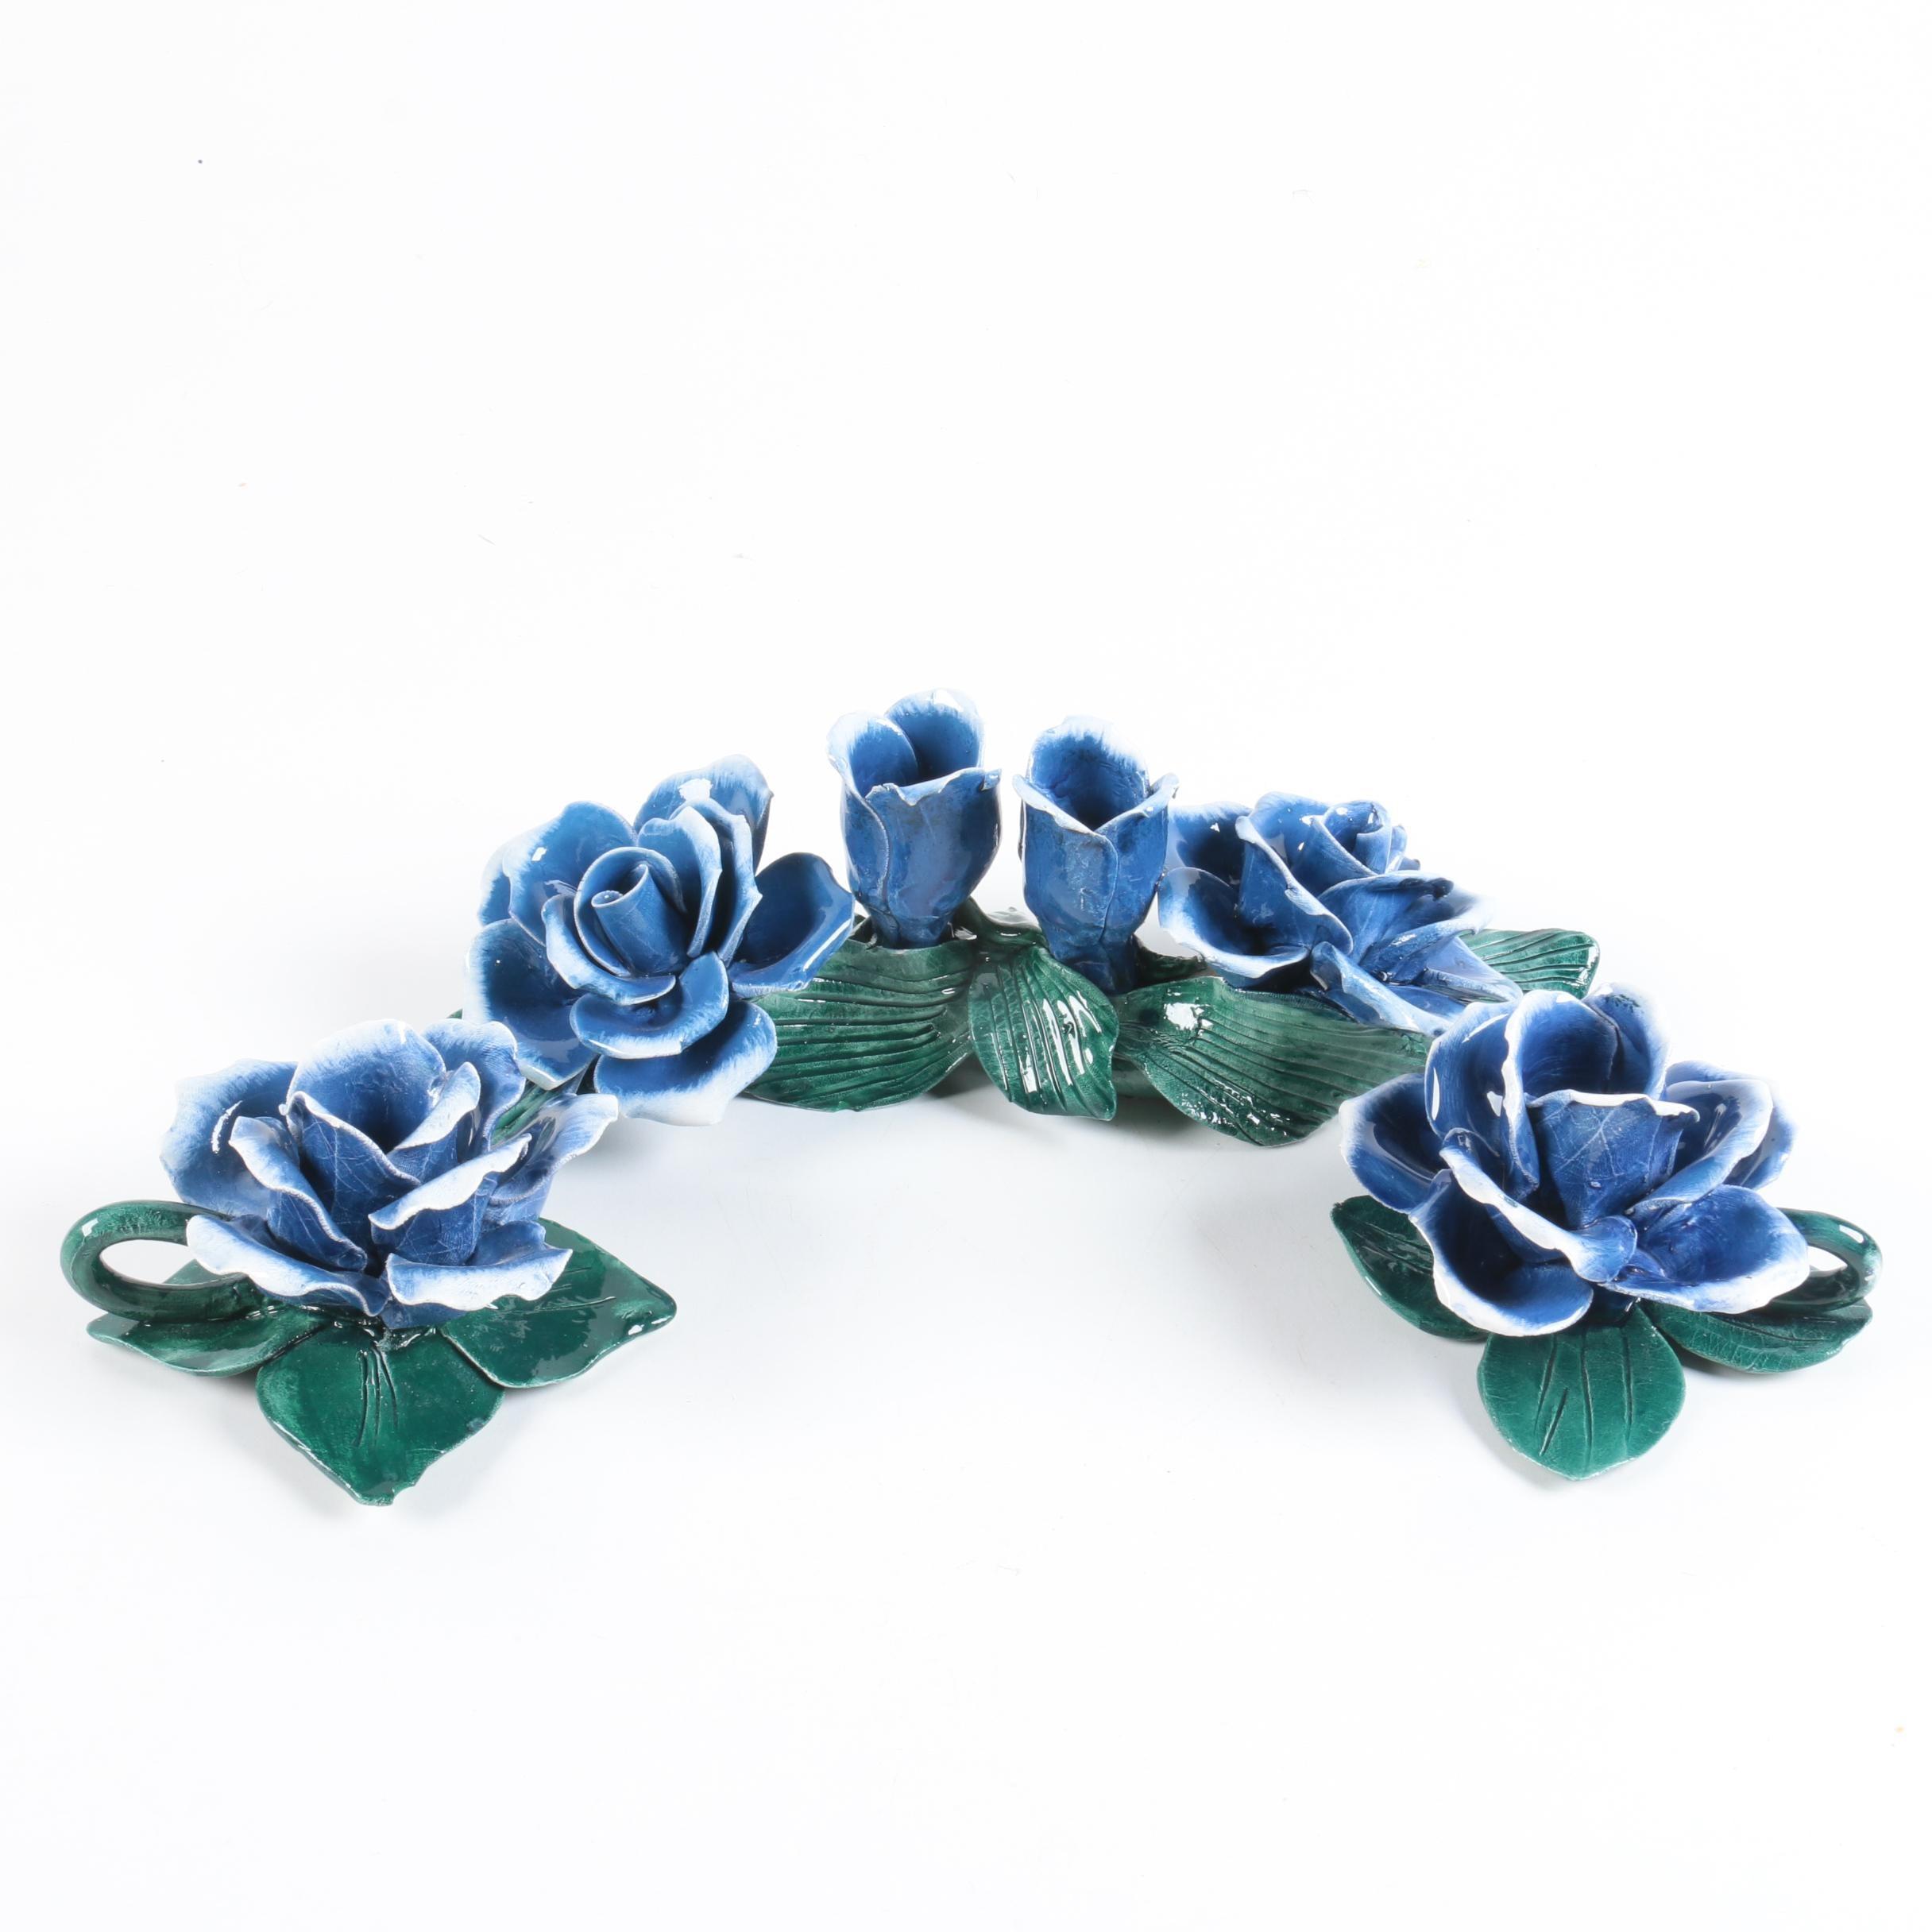 Italian Ceramic Rose Candle Holders